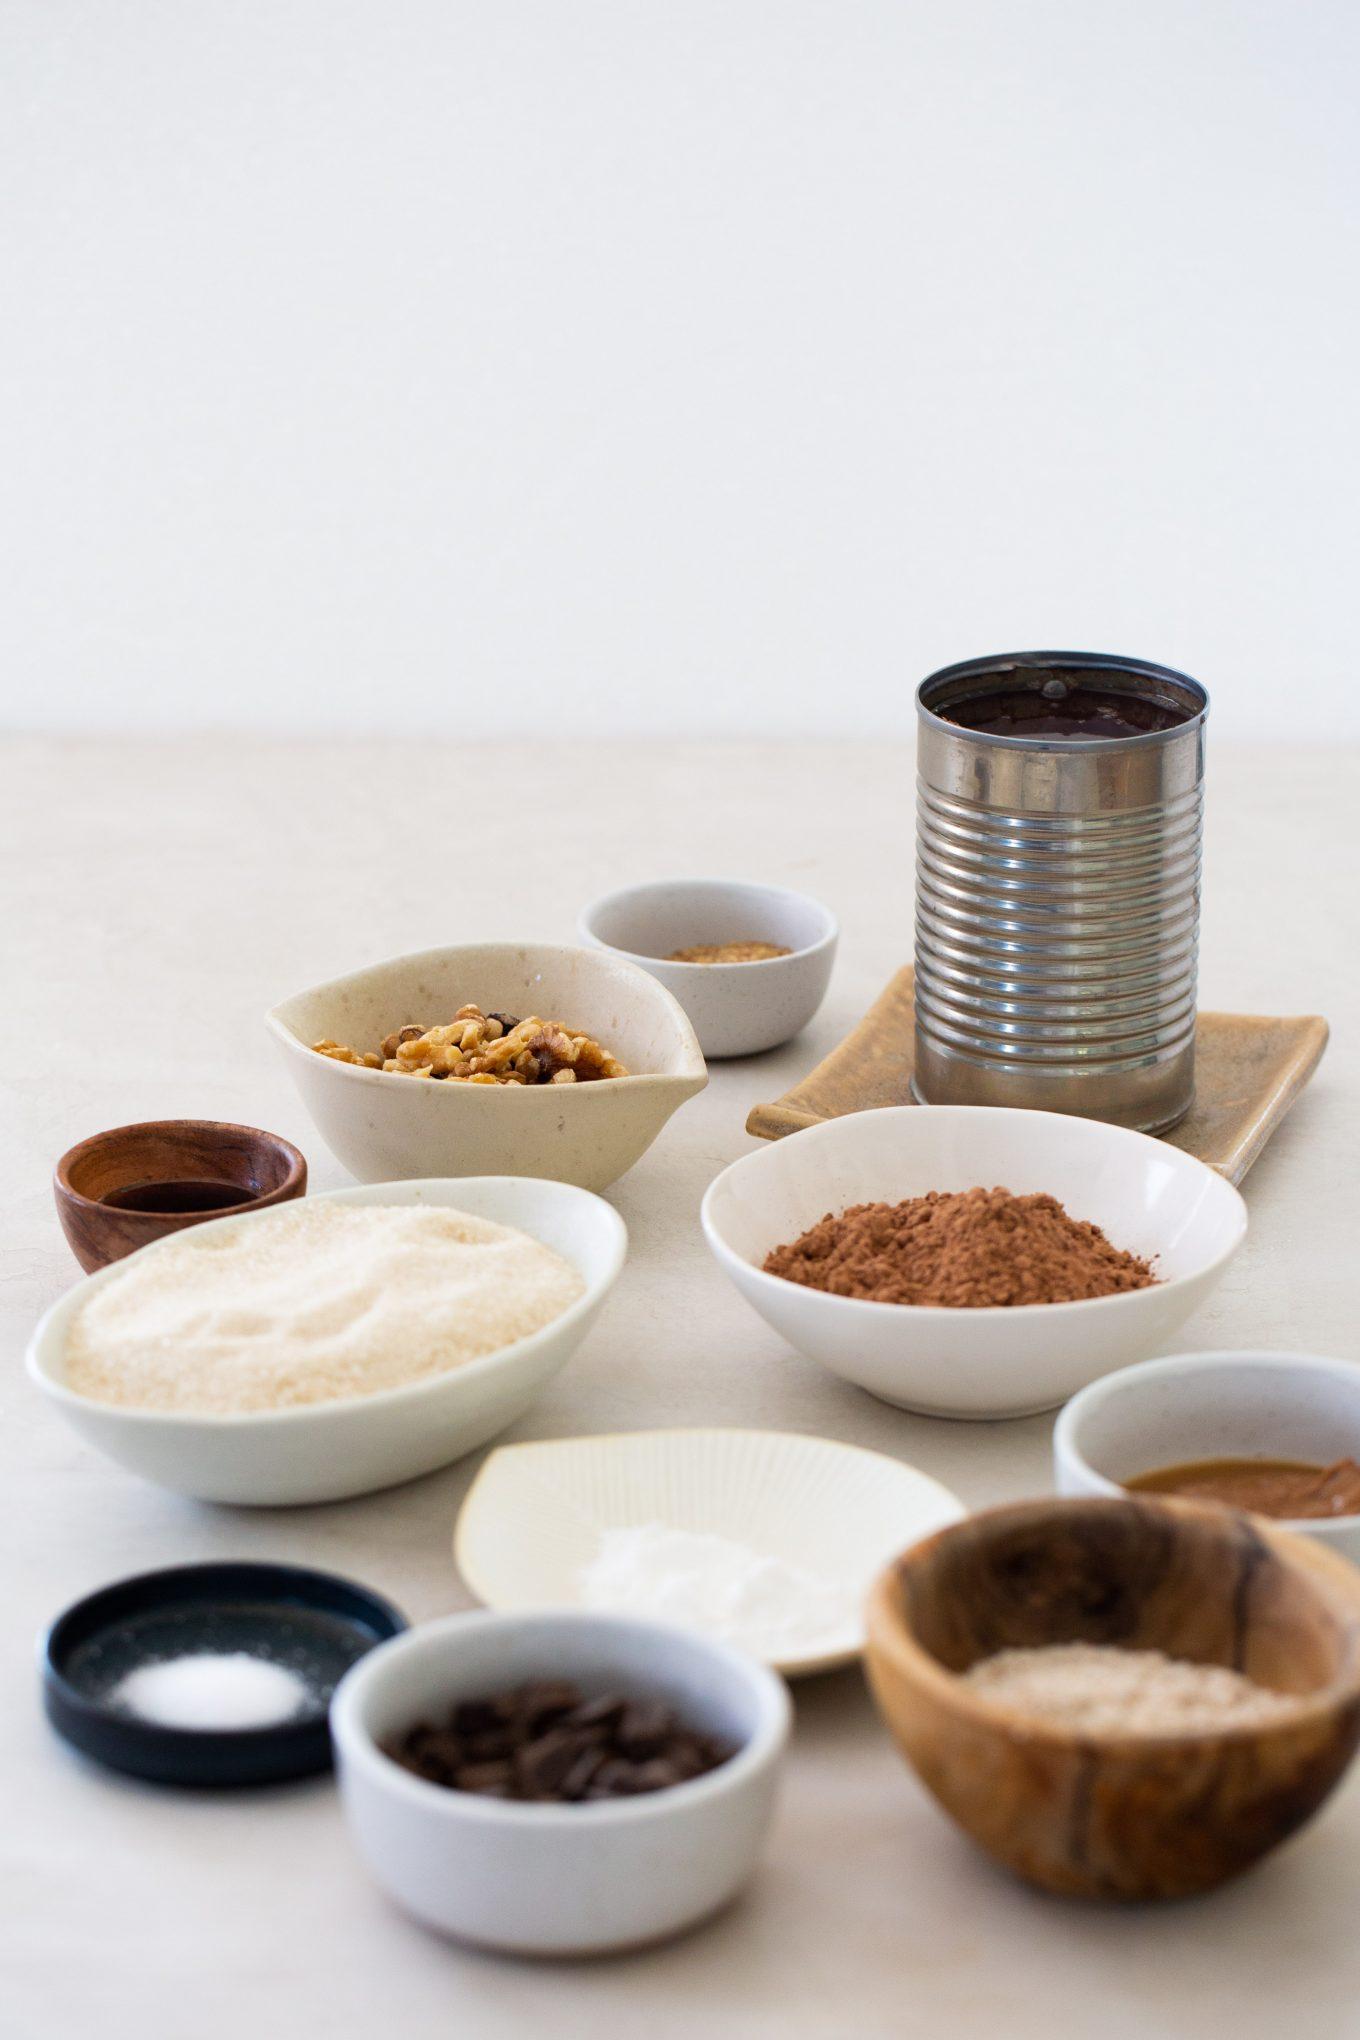 ingredientes para hacer brownies de frijol negro